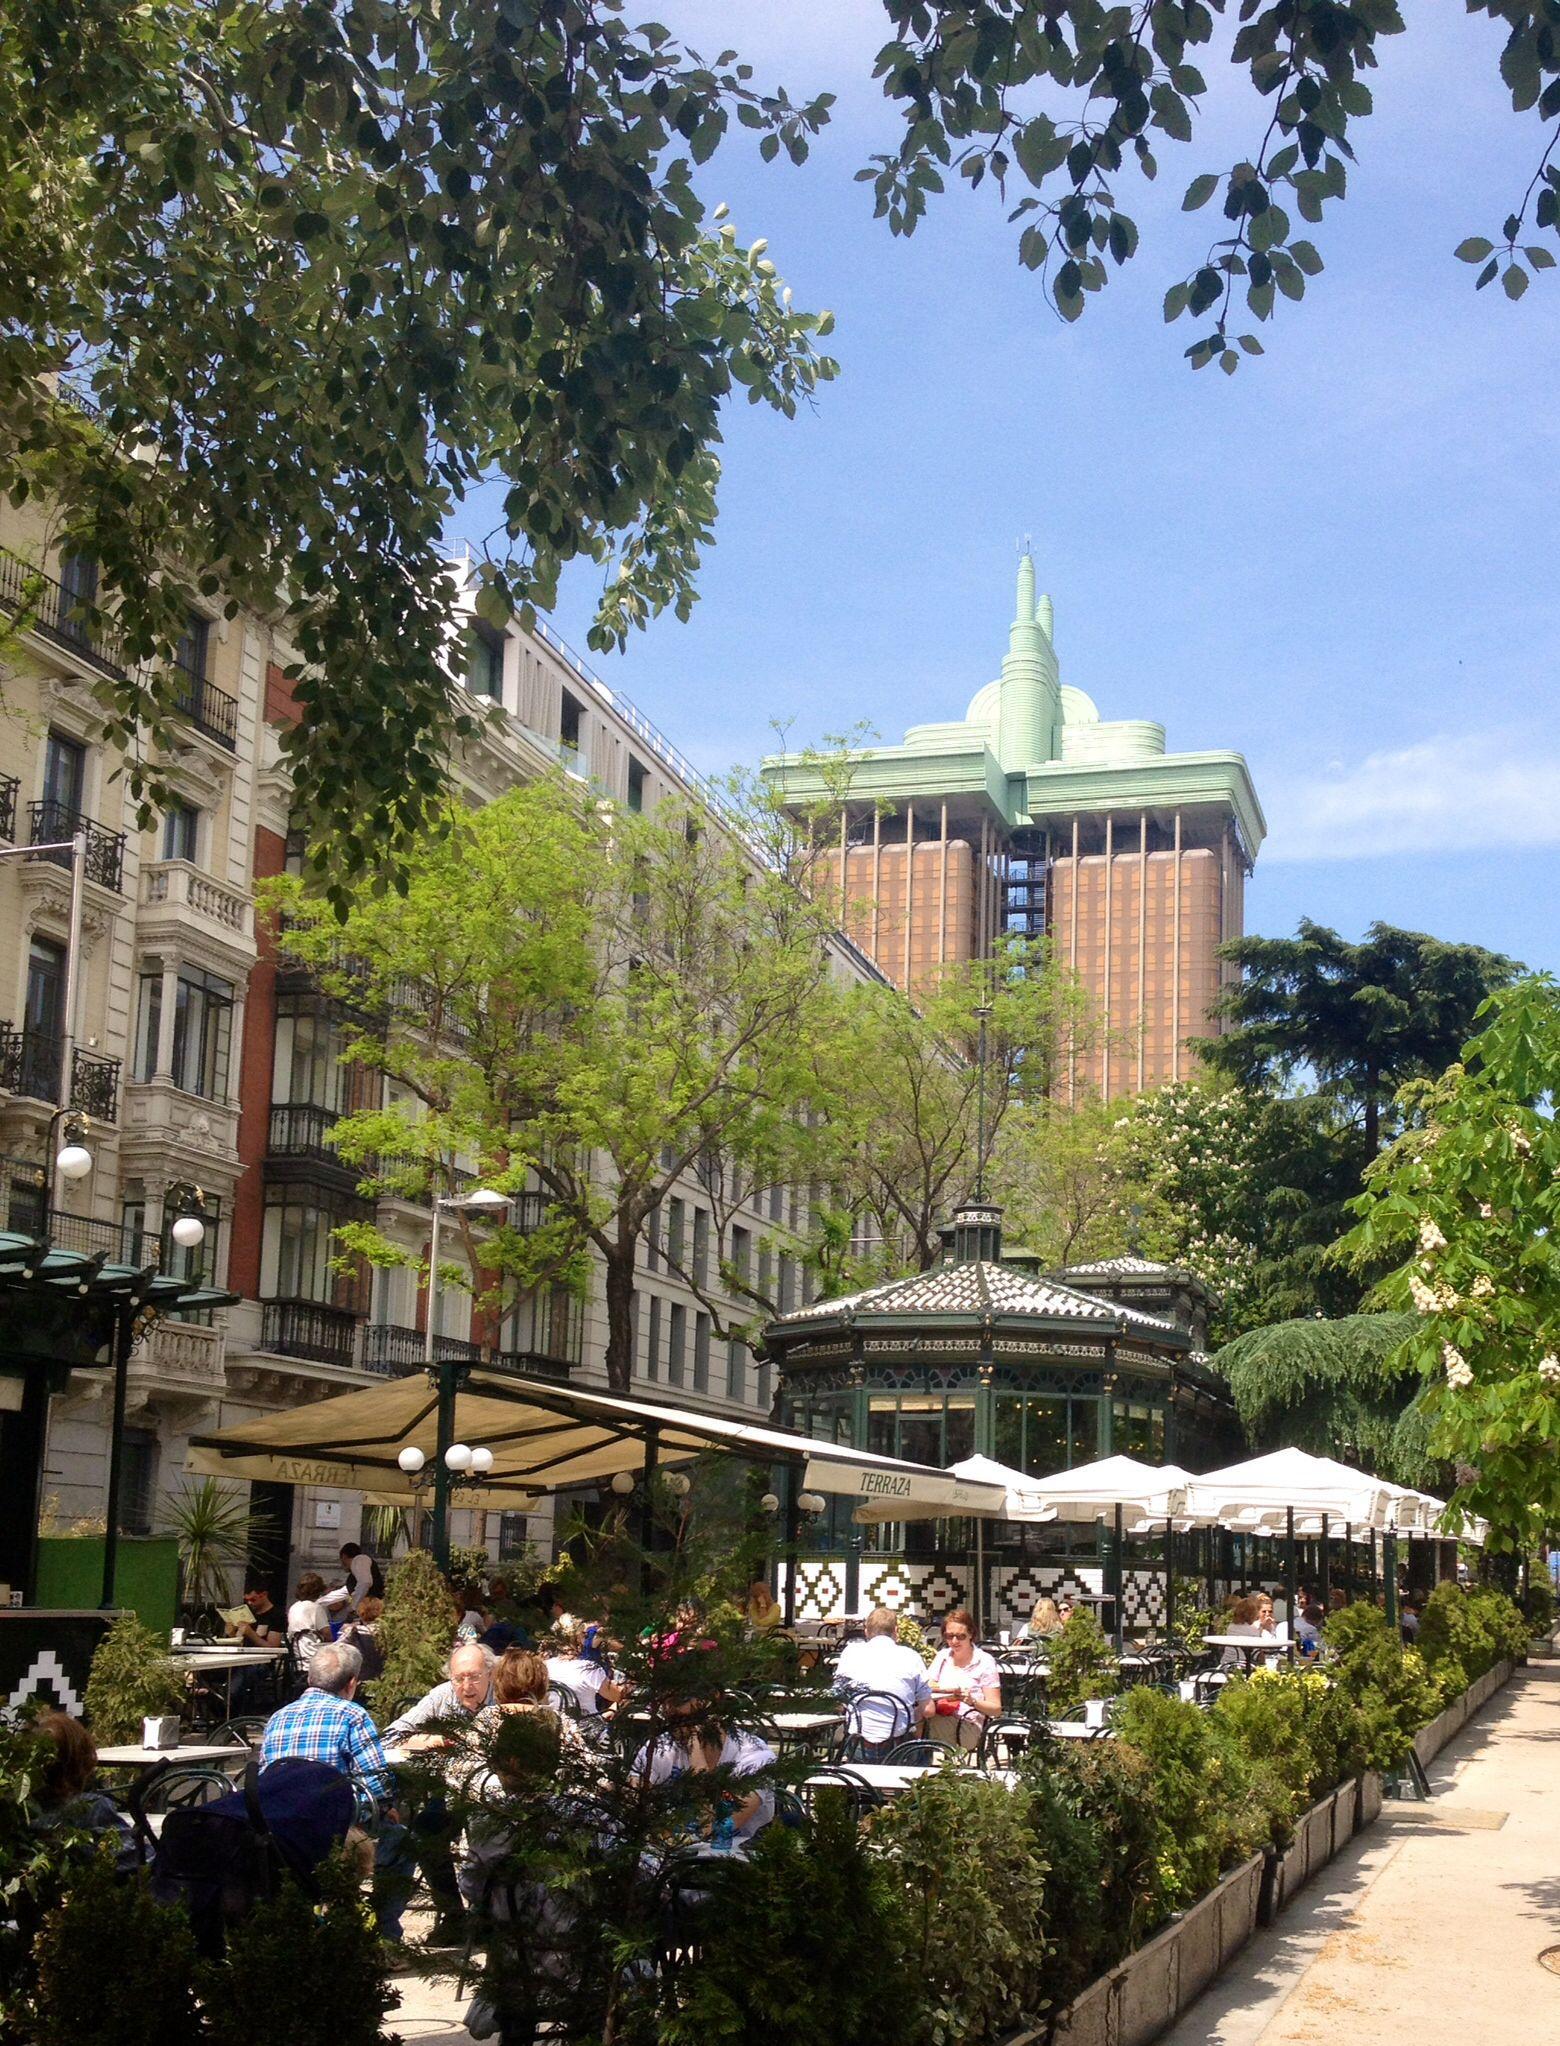 Terraza De El Espejo Recoletos Espana Ciudades Espanolas Paisajes